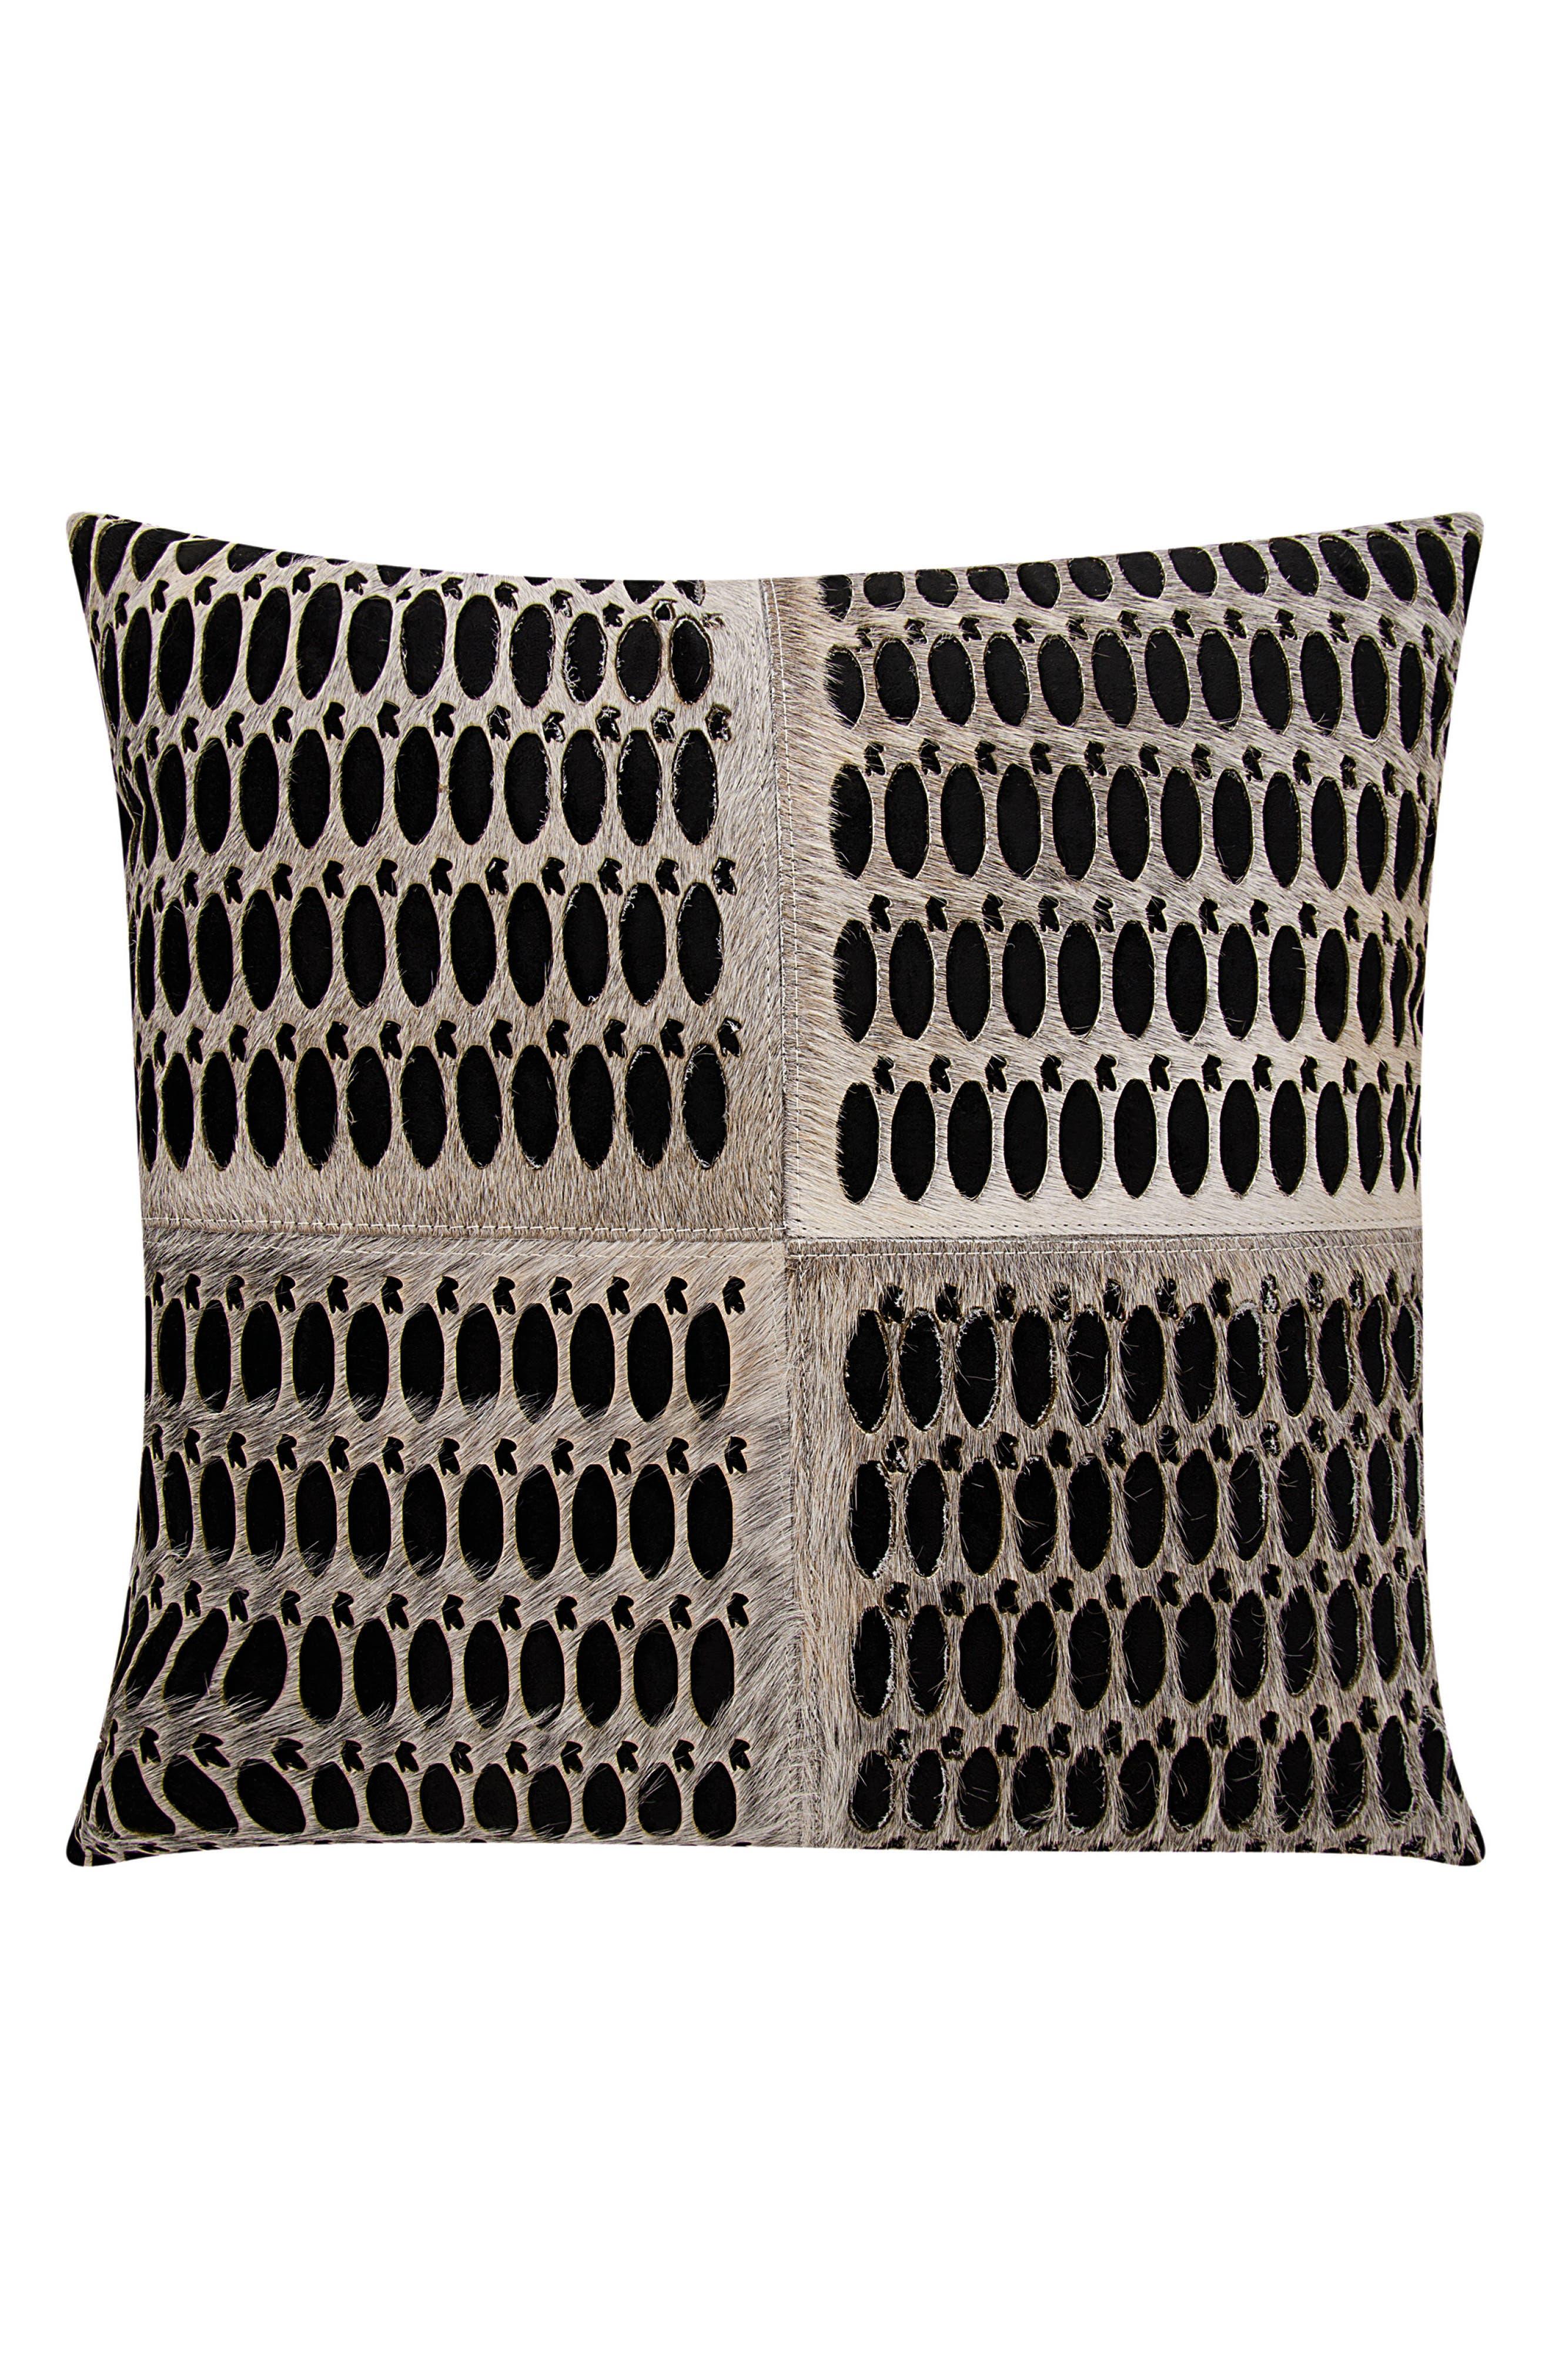 MINA VICTORY Calf Hair Accent Pillow, Main, color, 062